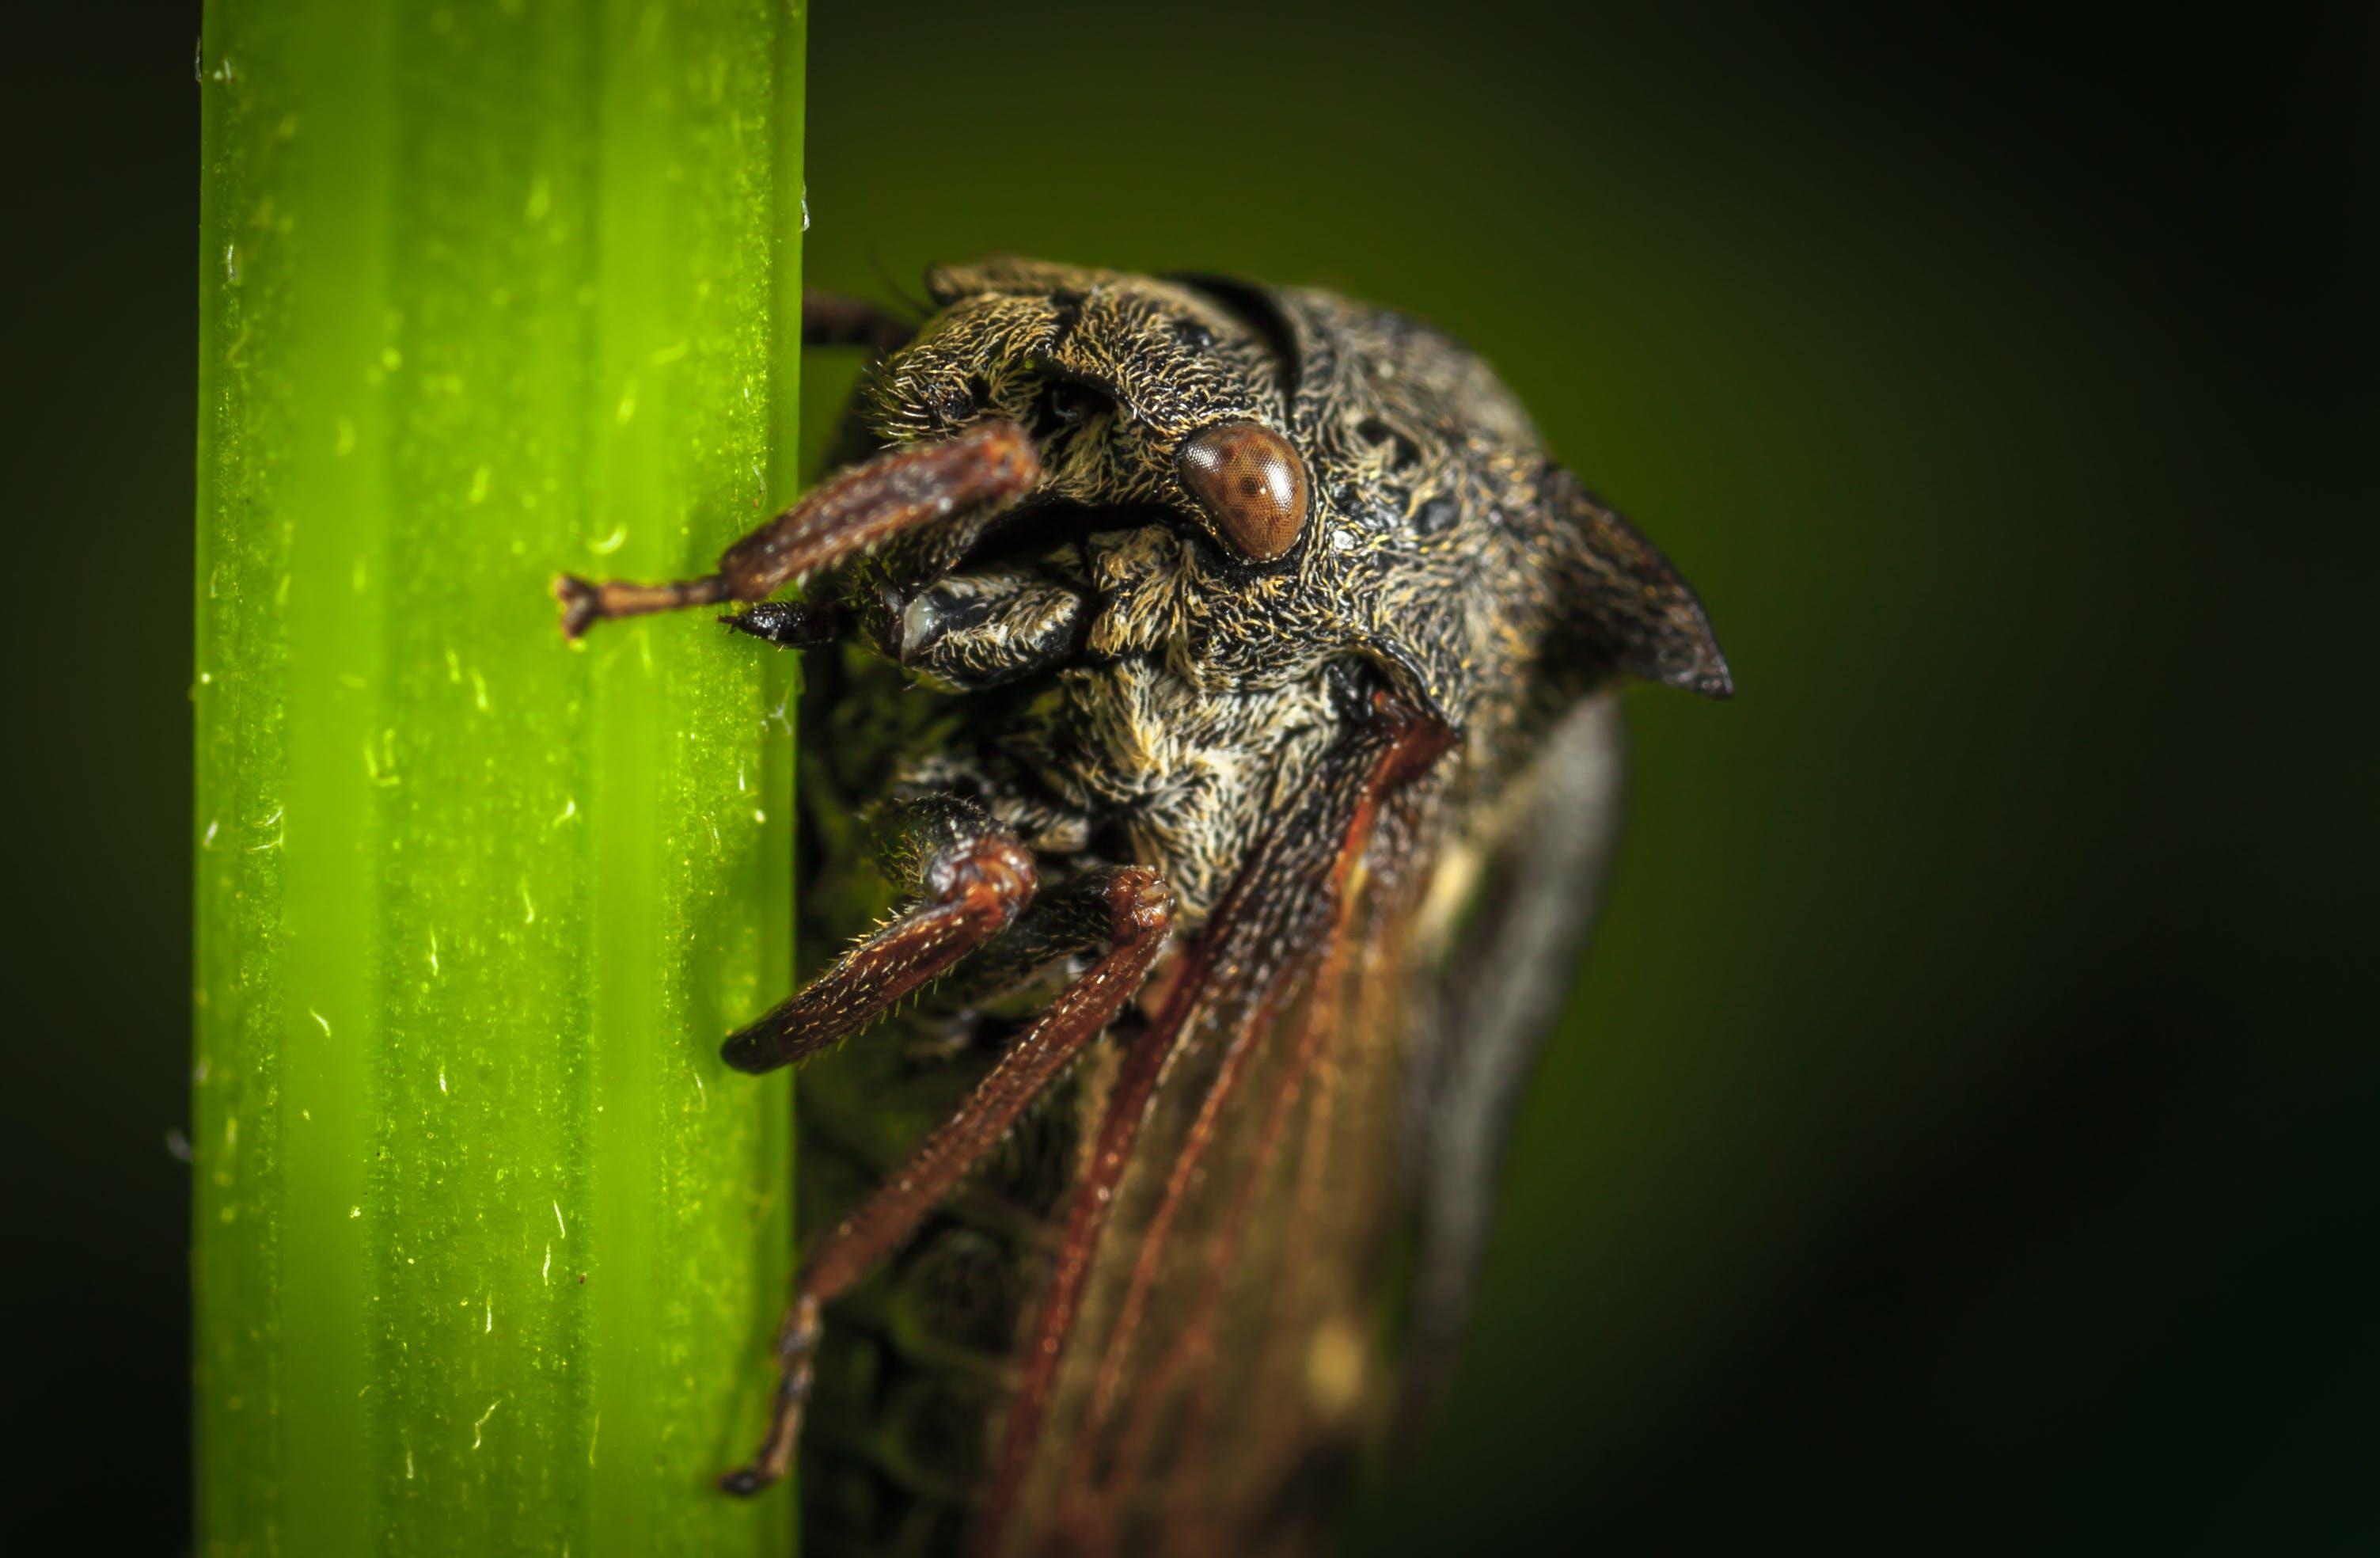 Close Up Photo of Black Cicada on Green Leaf